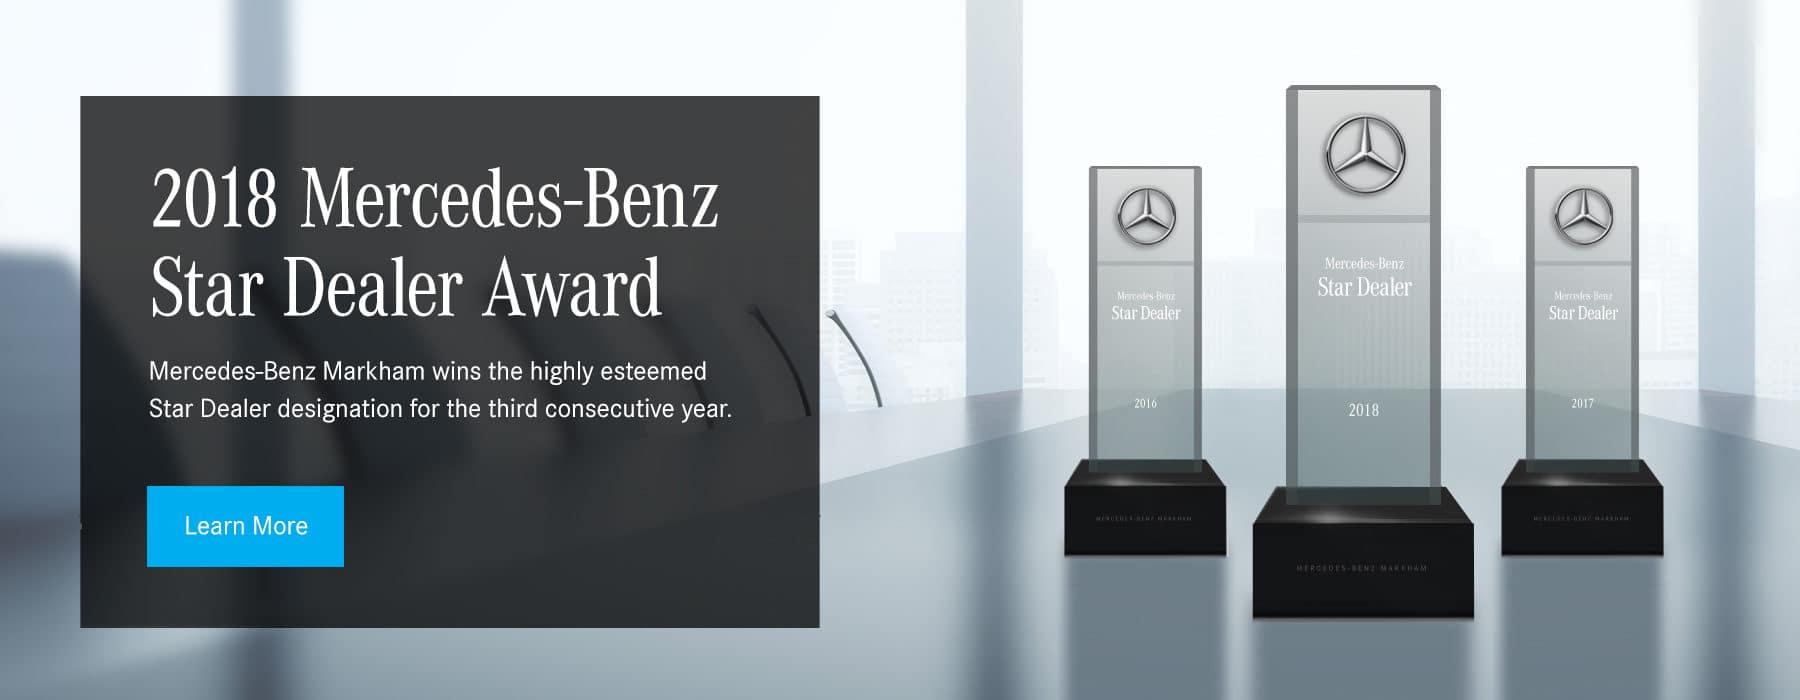 near next bay autobahn pause motors dealer in benz area dealership mercedes belmont previous about htm